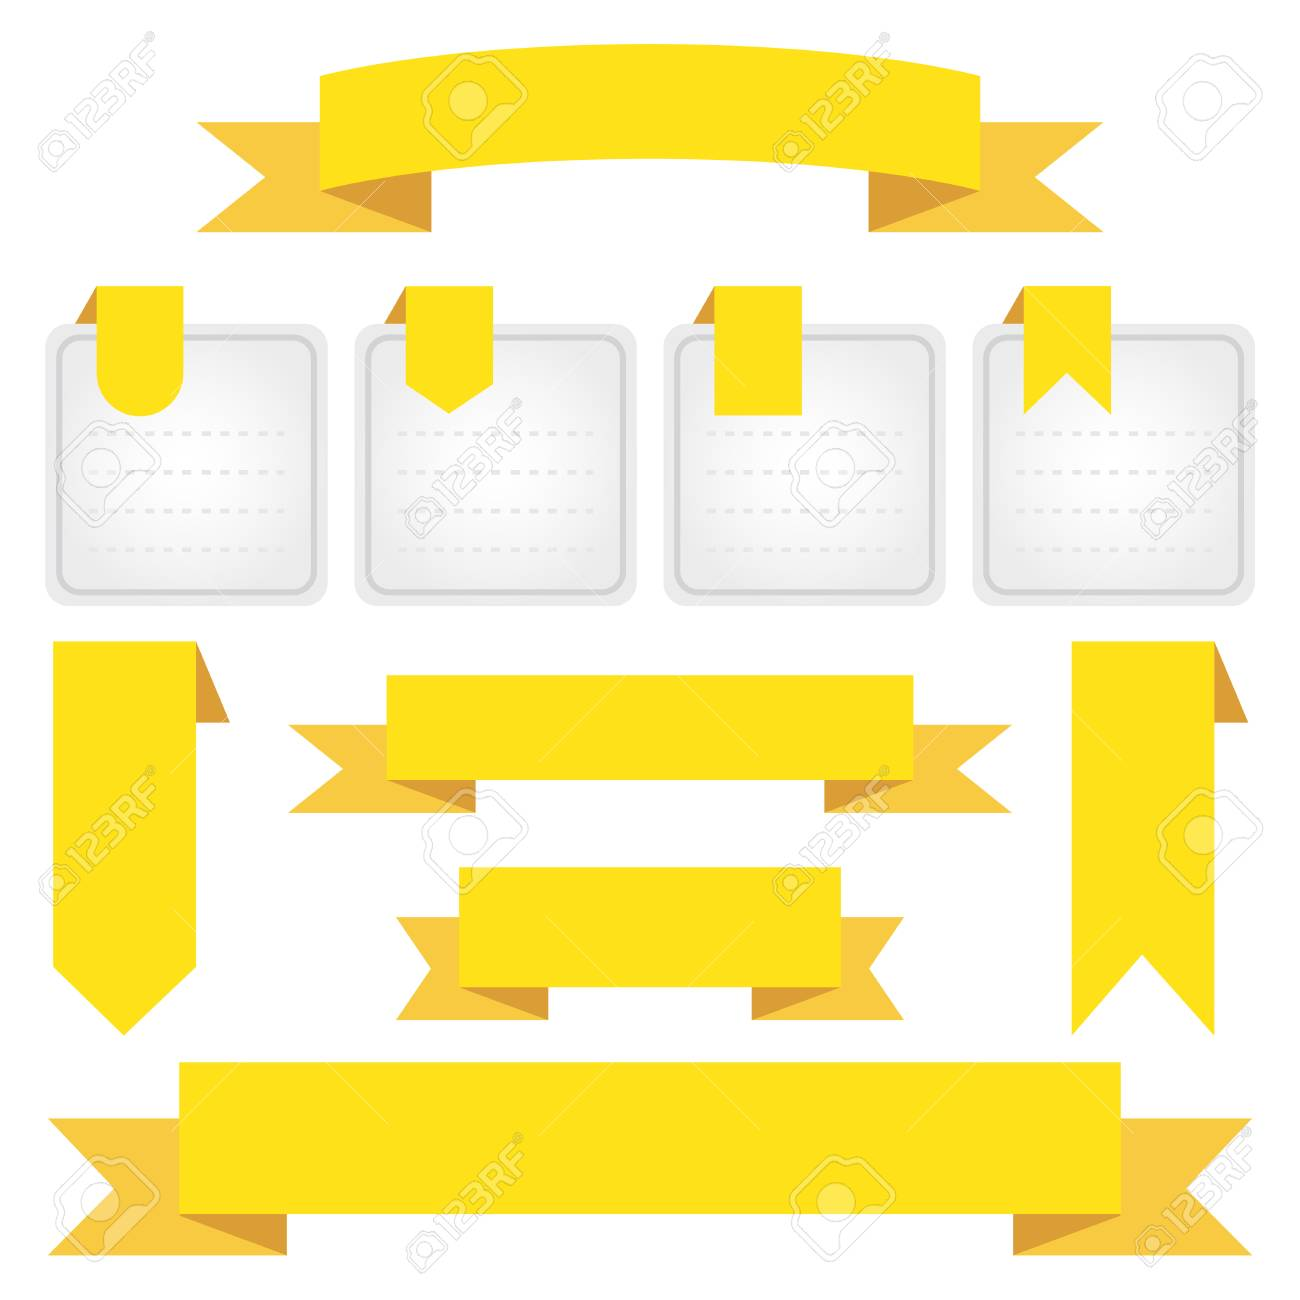 Set of blank yellow ribbon banners, vector illustration.